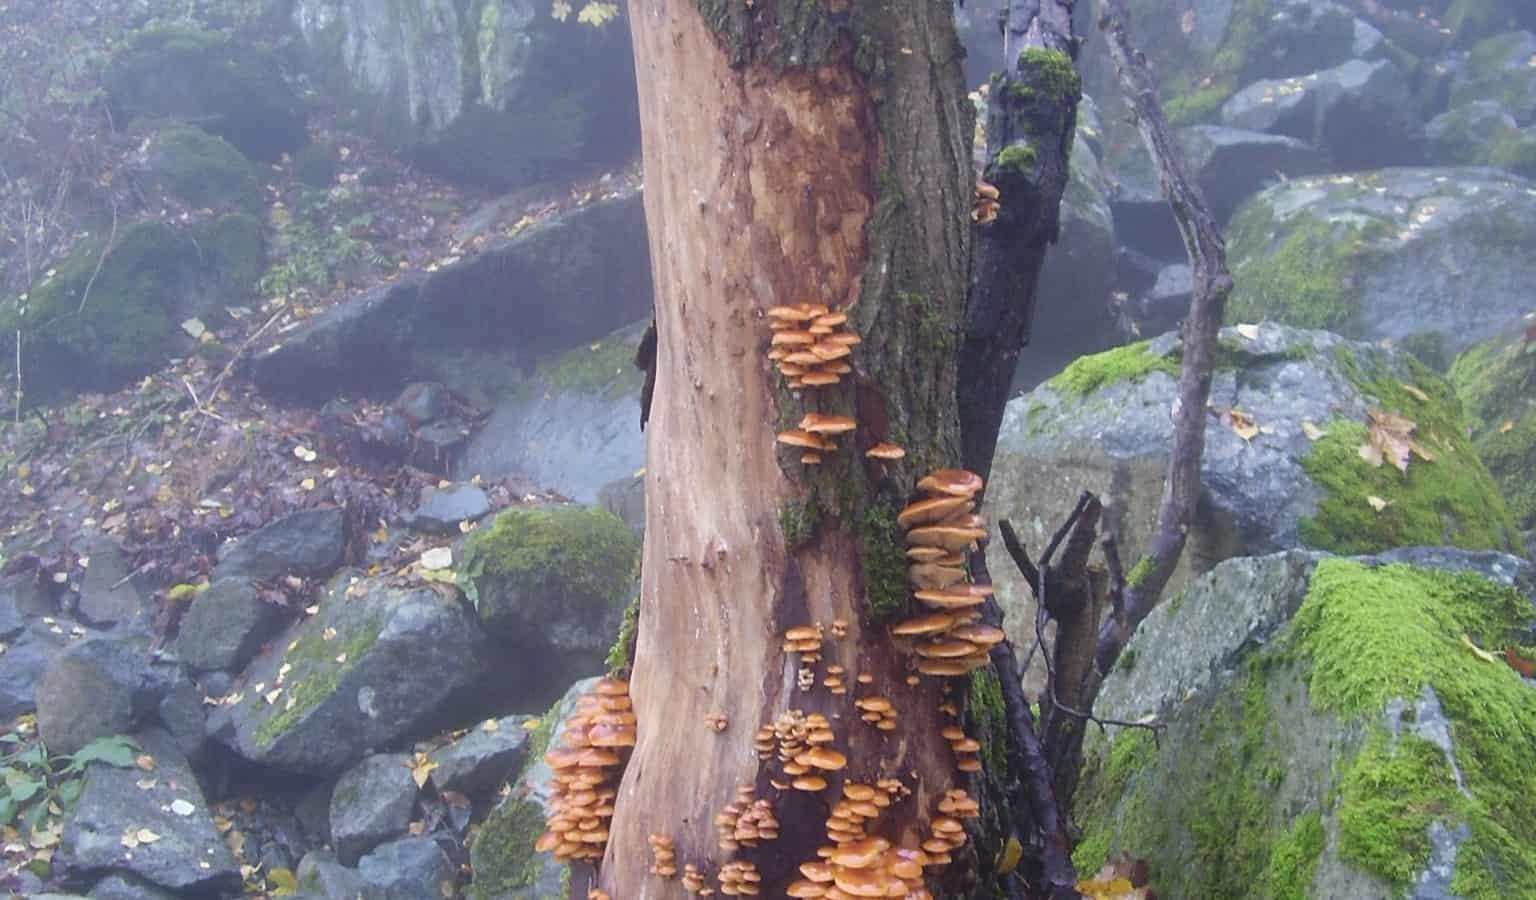 Symbiosis - photo: Vitosha Nature Park